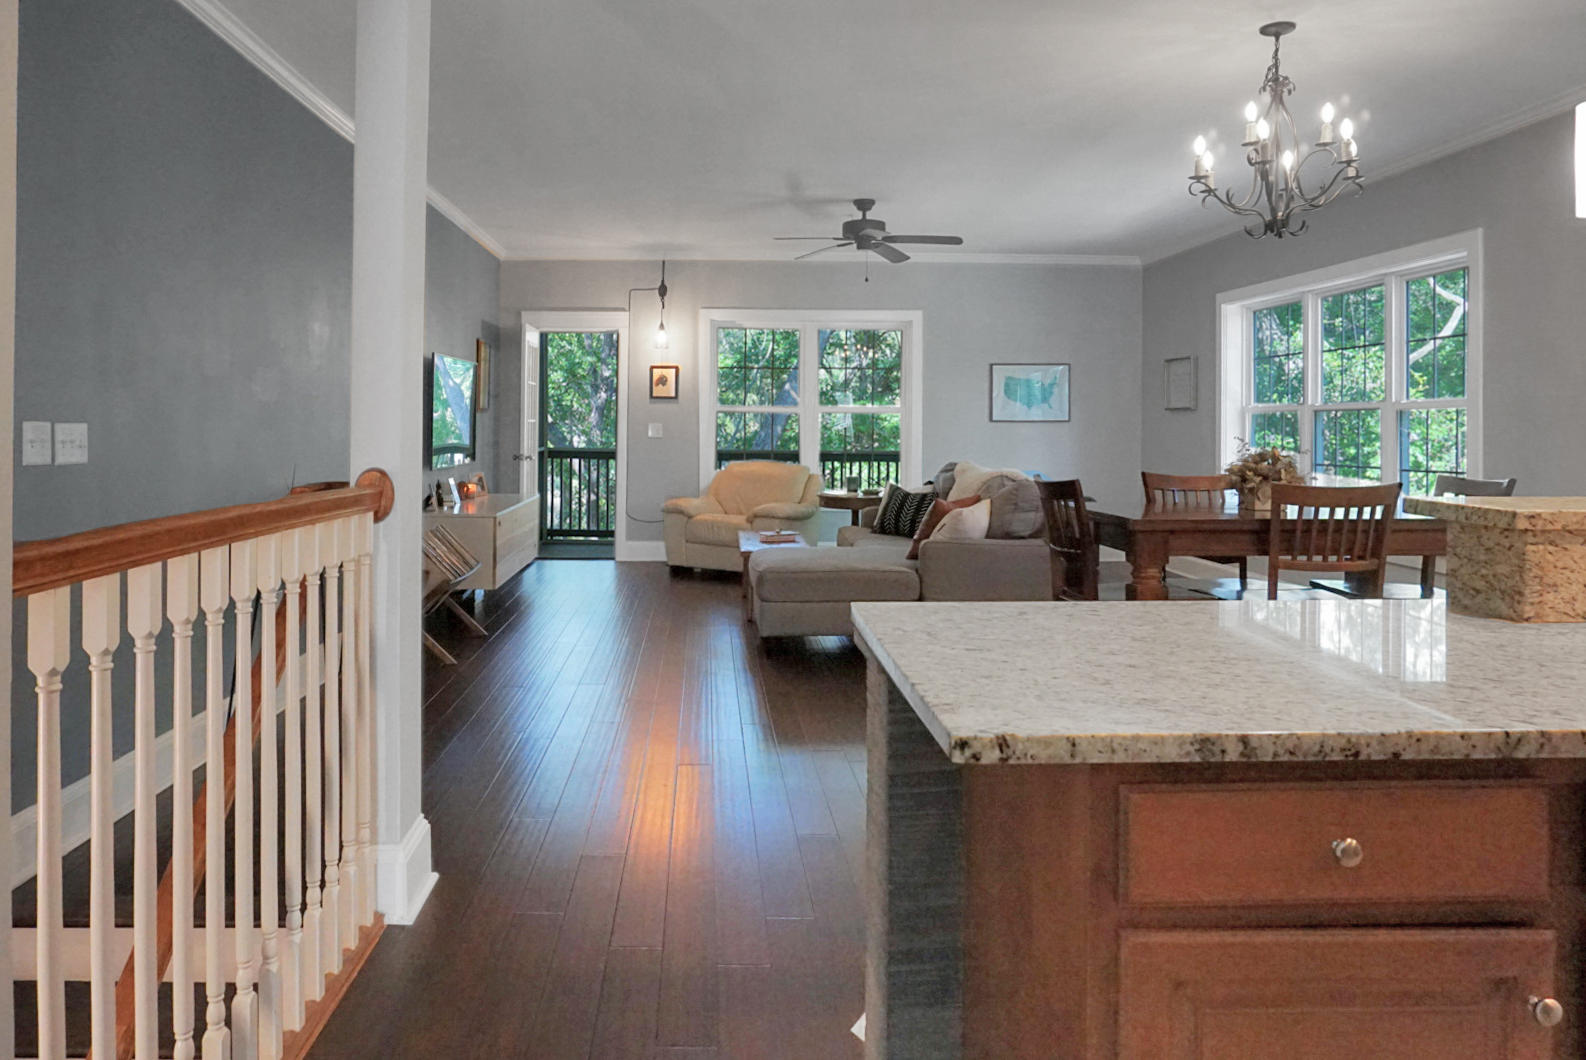 Etiwan Pointe Homes For Sale - 269 Etiwan Pointe, Mount Pleasant, SC - 54